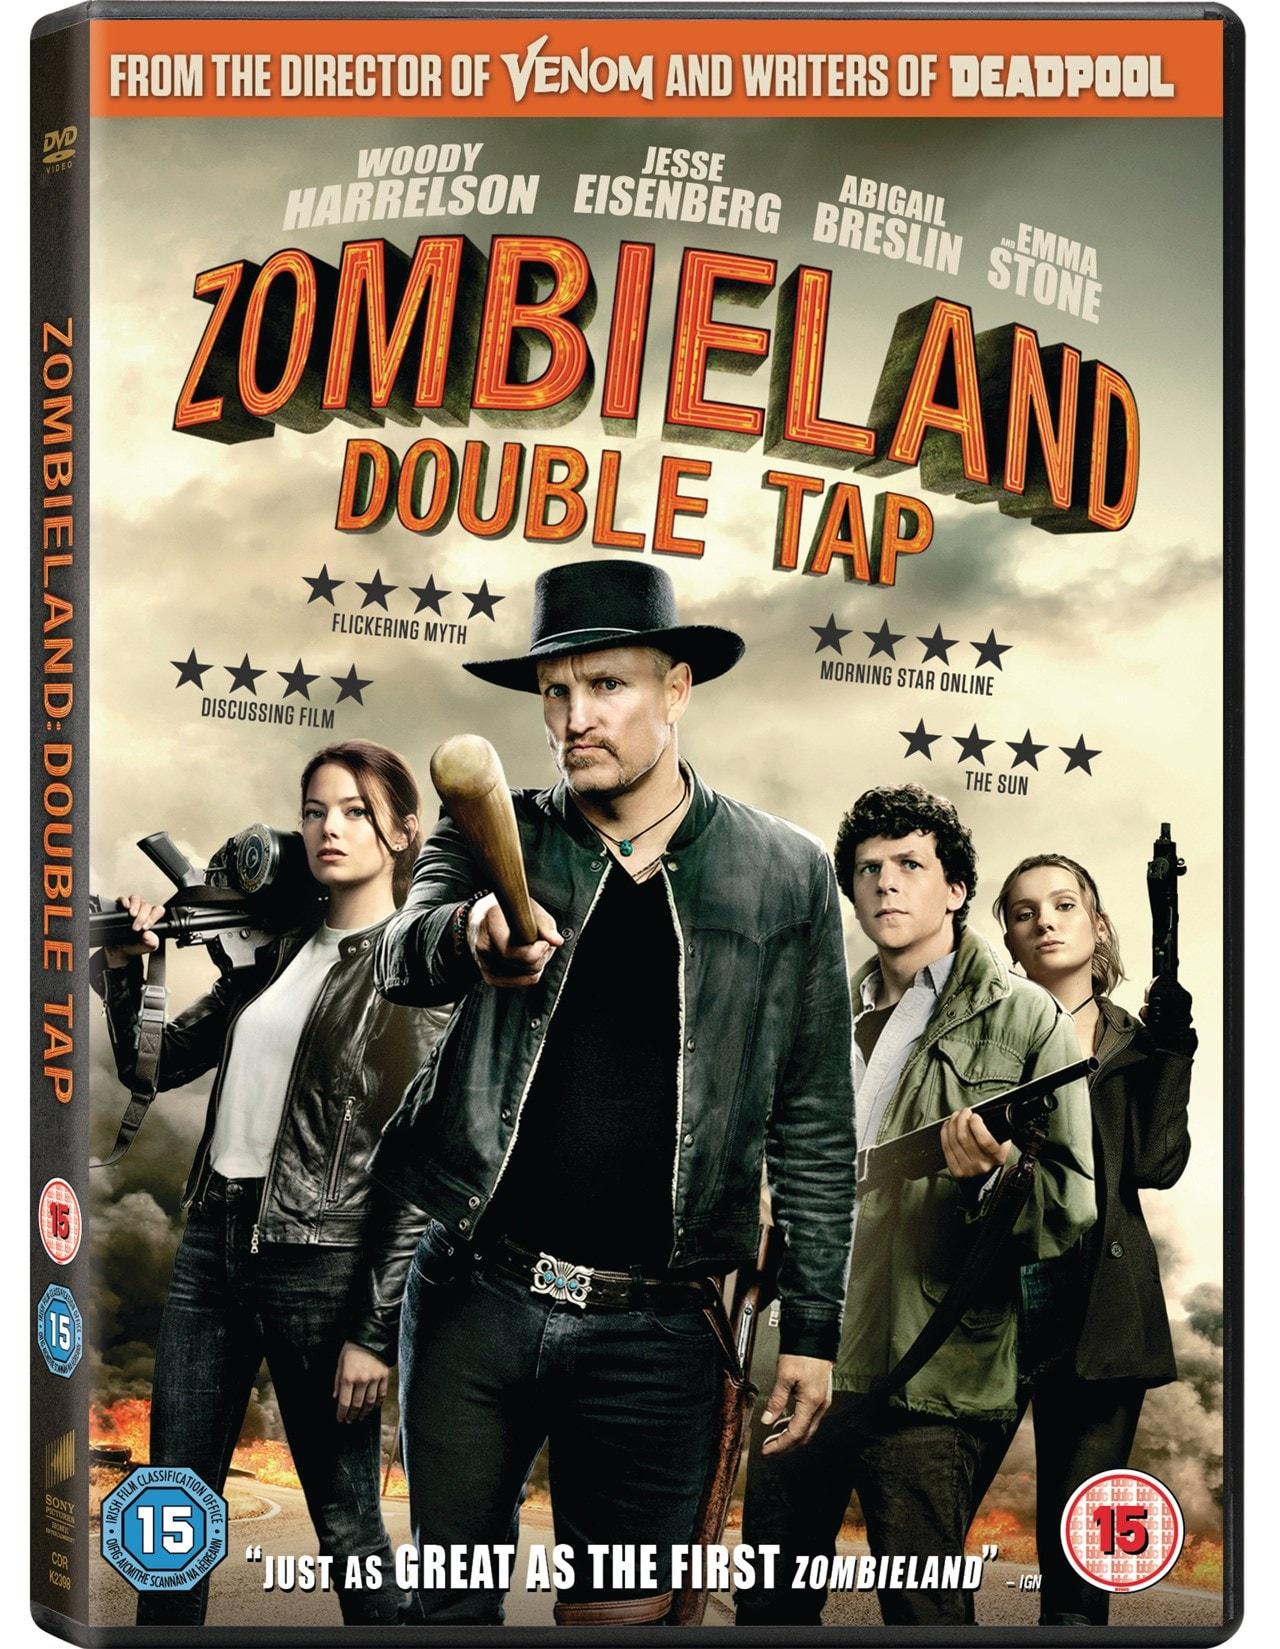 Zombieland: Double Tap - 2